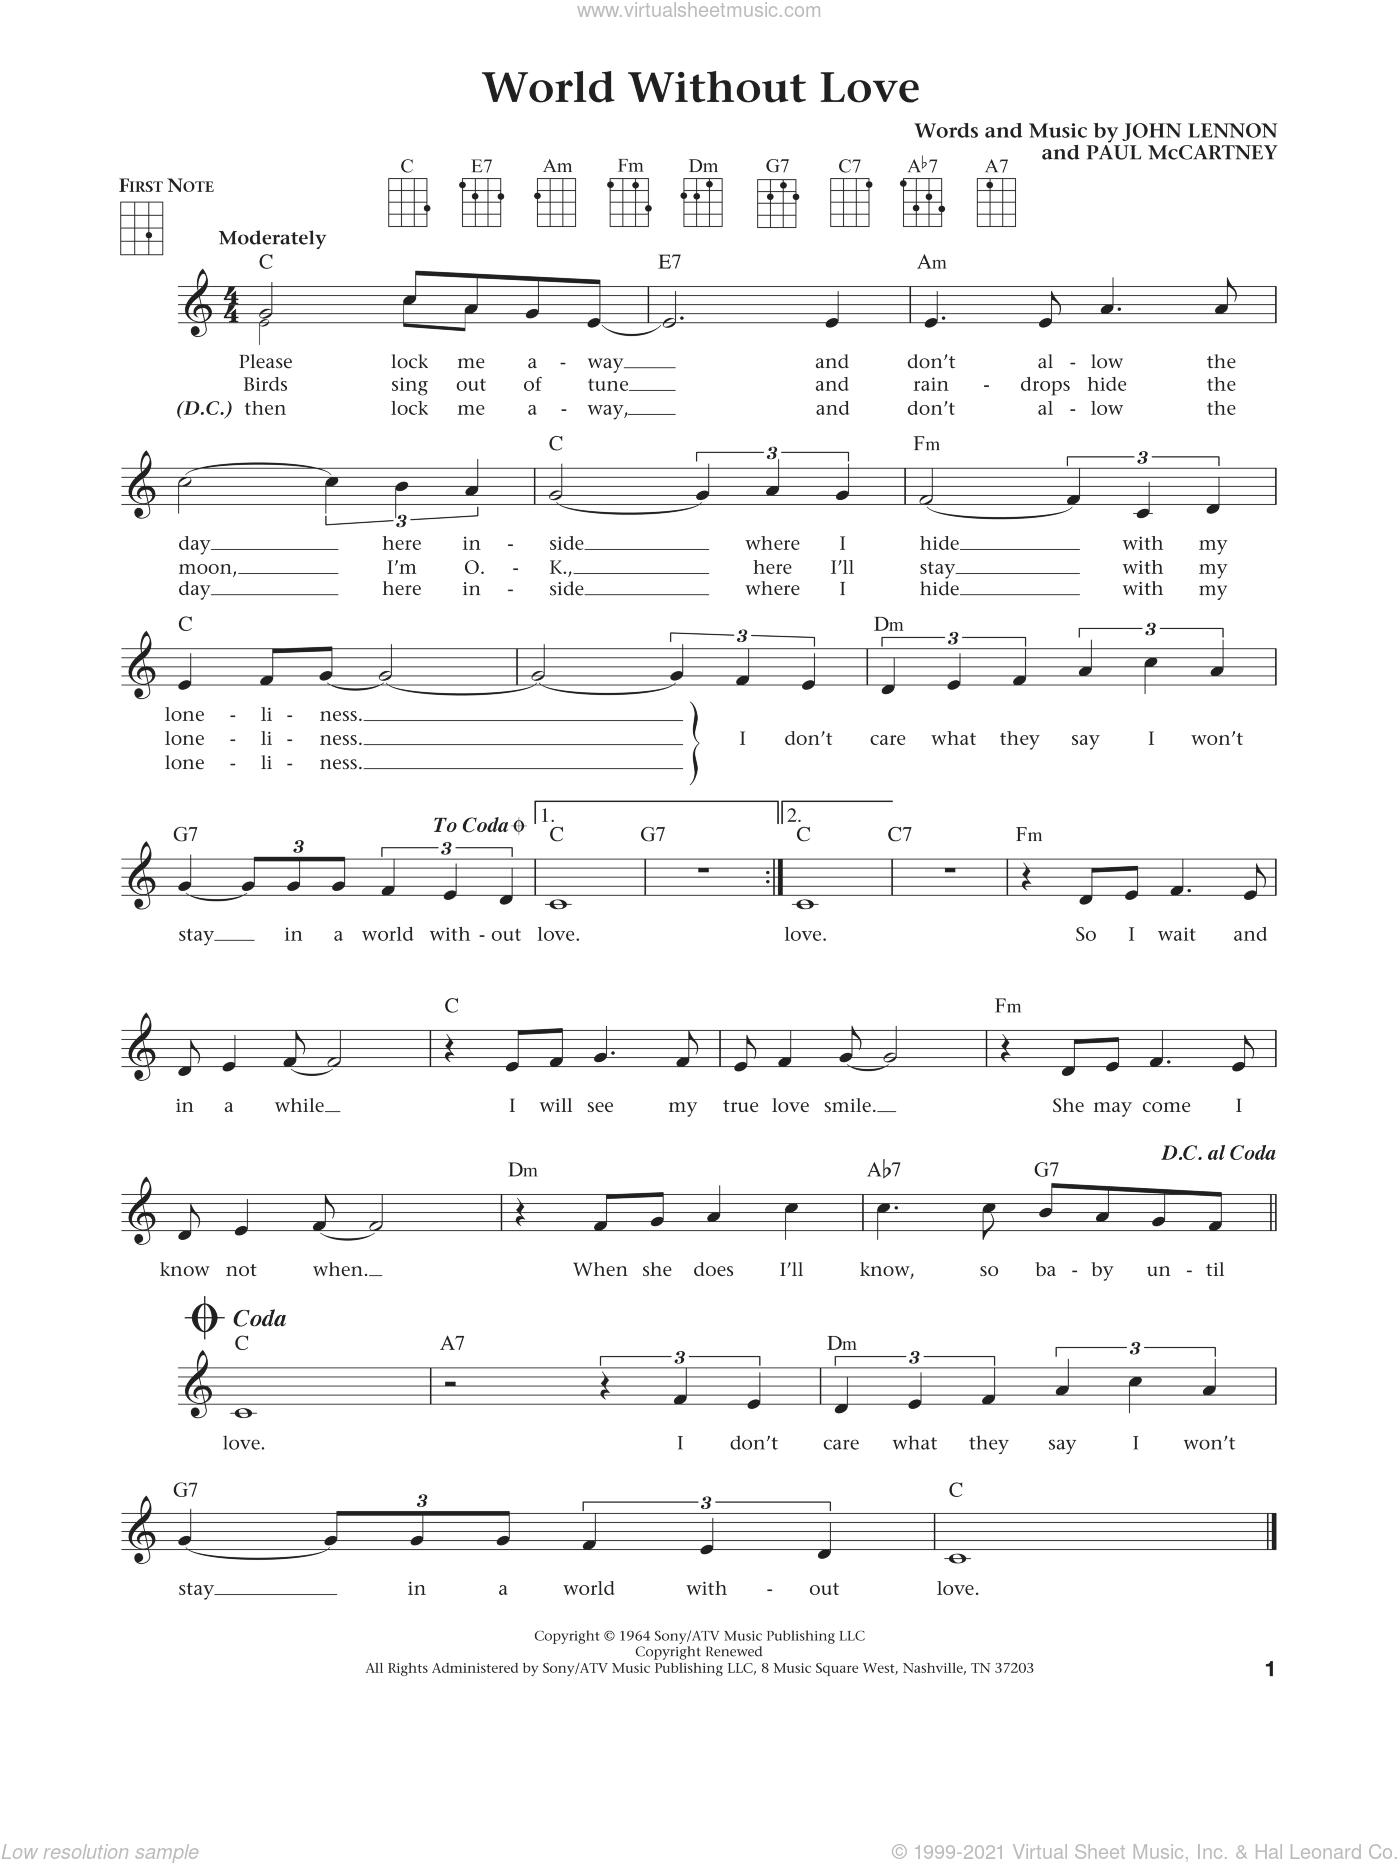 World Without Love (from The Daily Ukulele) (arr. Liz and Jim Beloff) sheet music for ukulele by Paul McCartney, Jim Beloff, Liz Beloff, Peter and Gordon and John Lennon, intermediate skill level